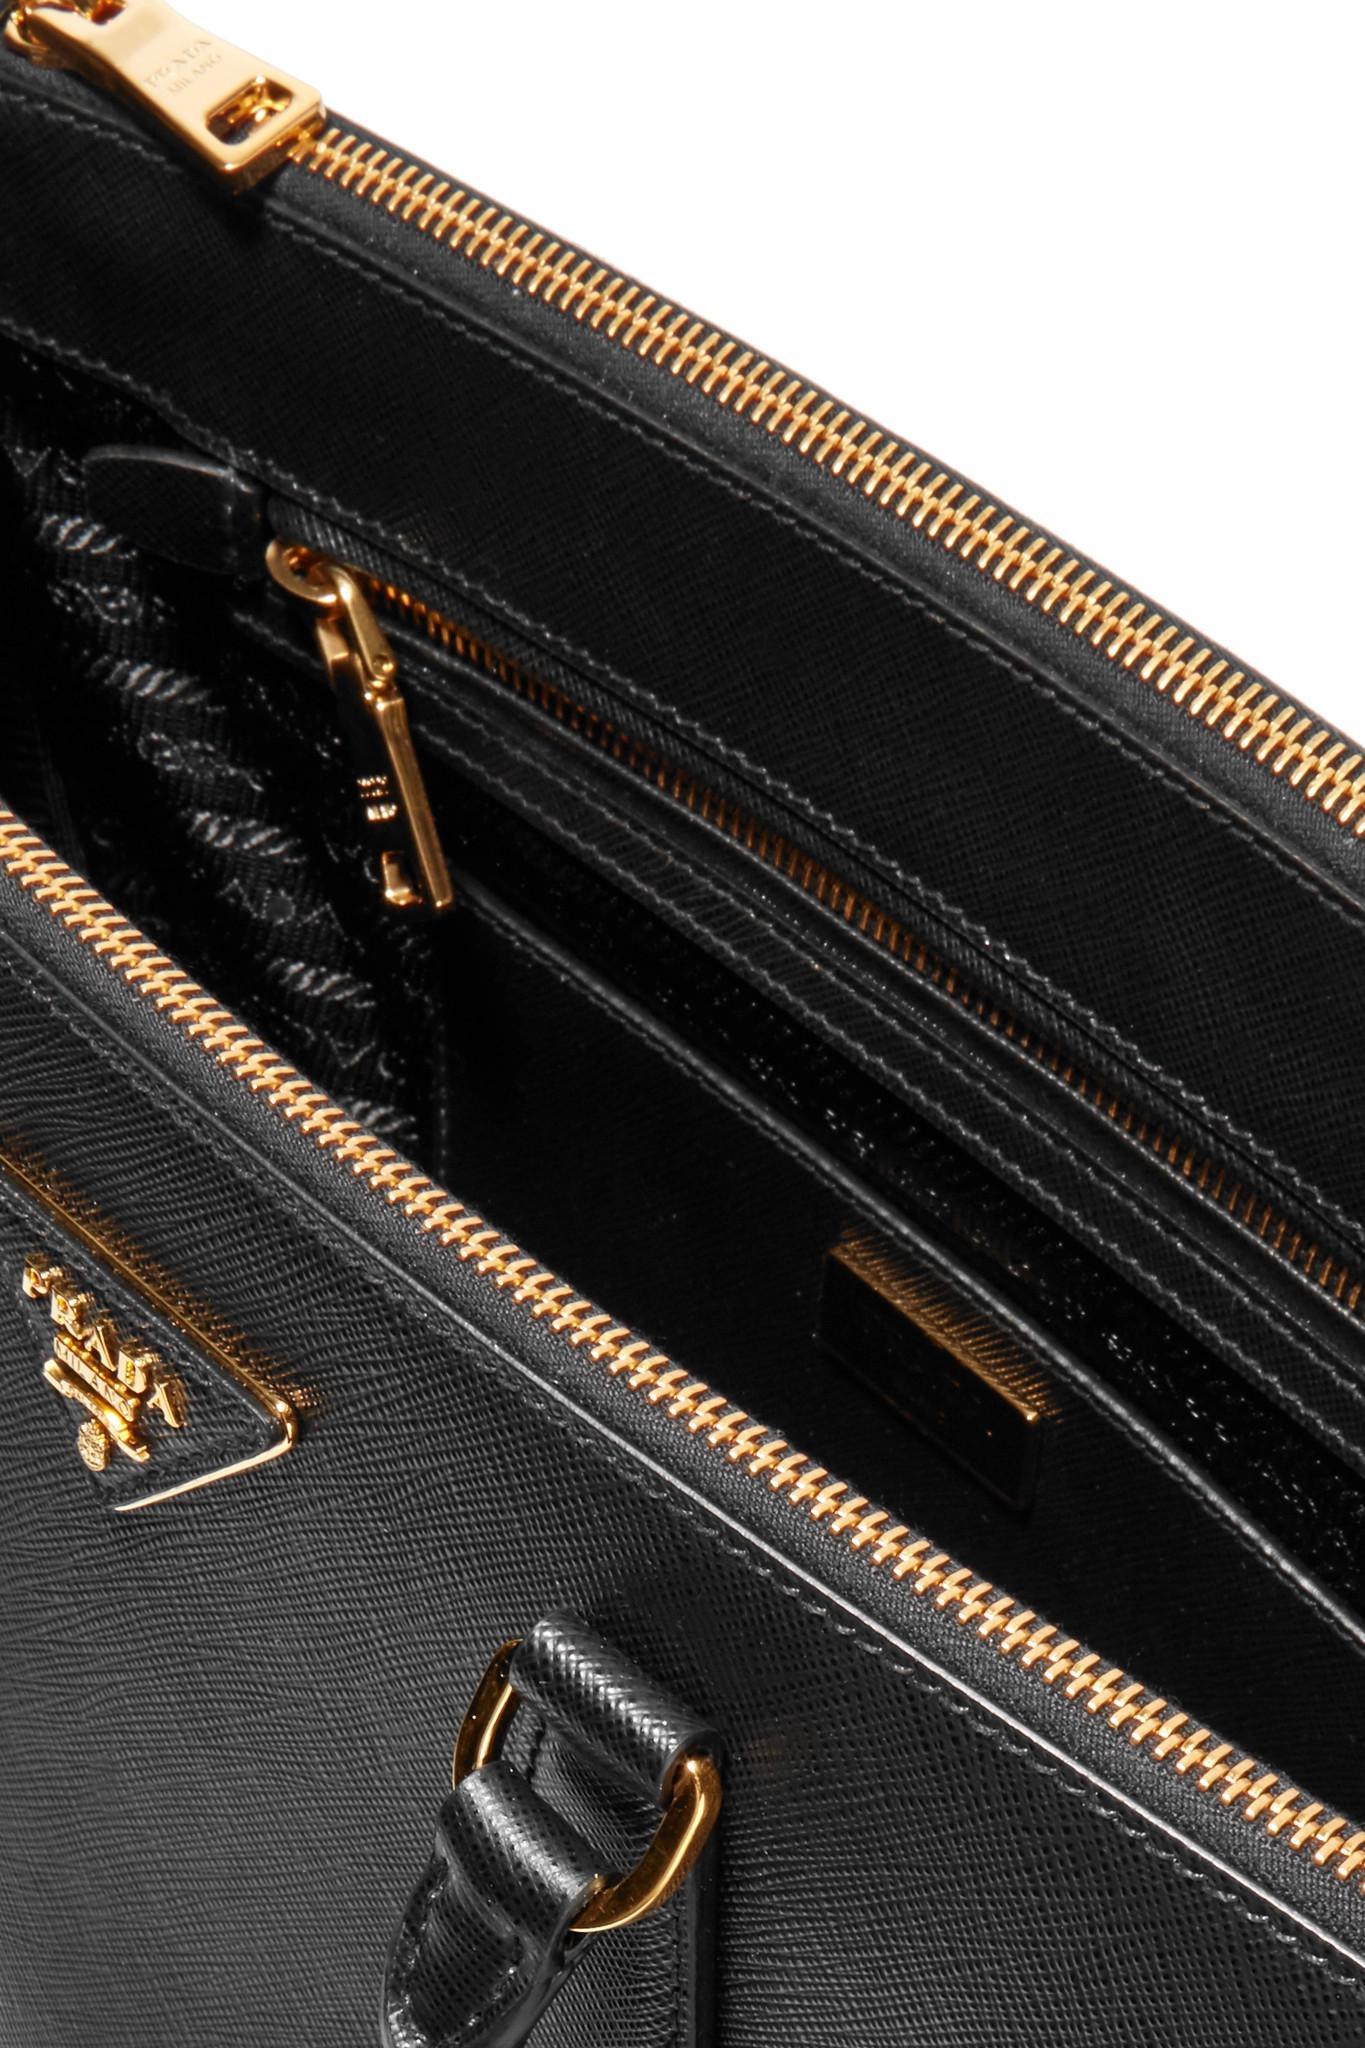 230f1ab85a Prada - Black Galleria Medium Textured-Leather Tote - Lyst. View fullscreen